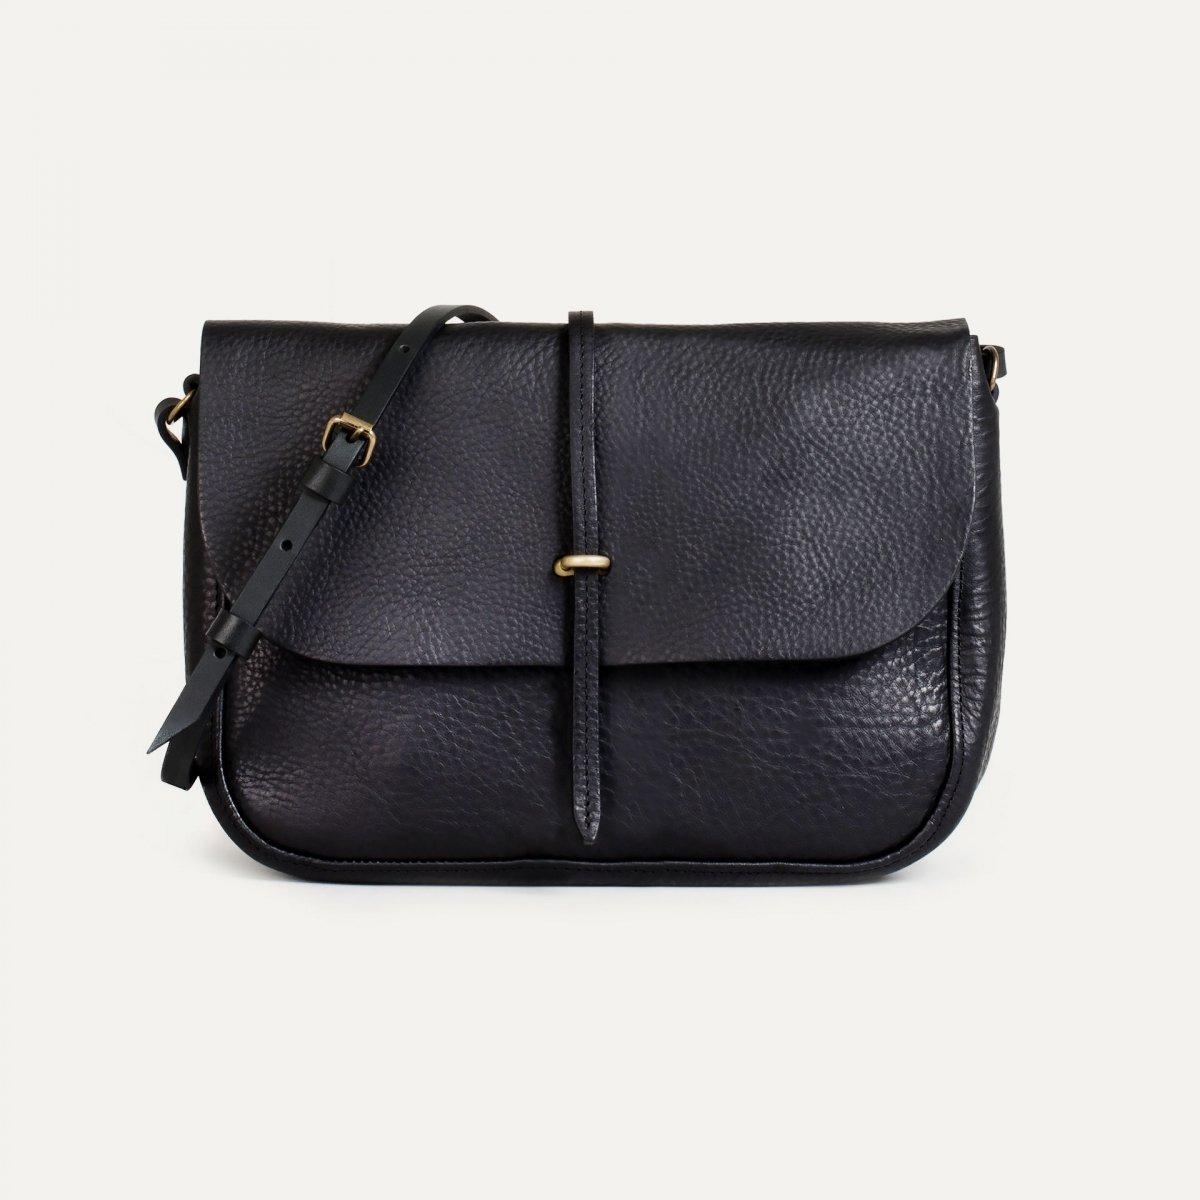 Pastel handbag - Black (image n°1)